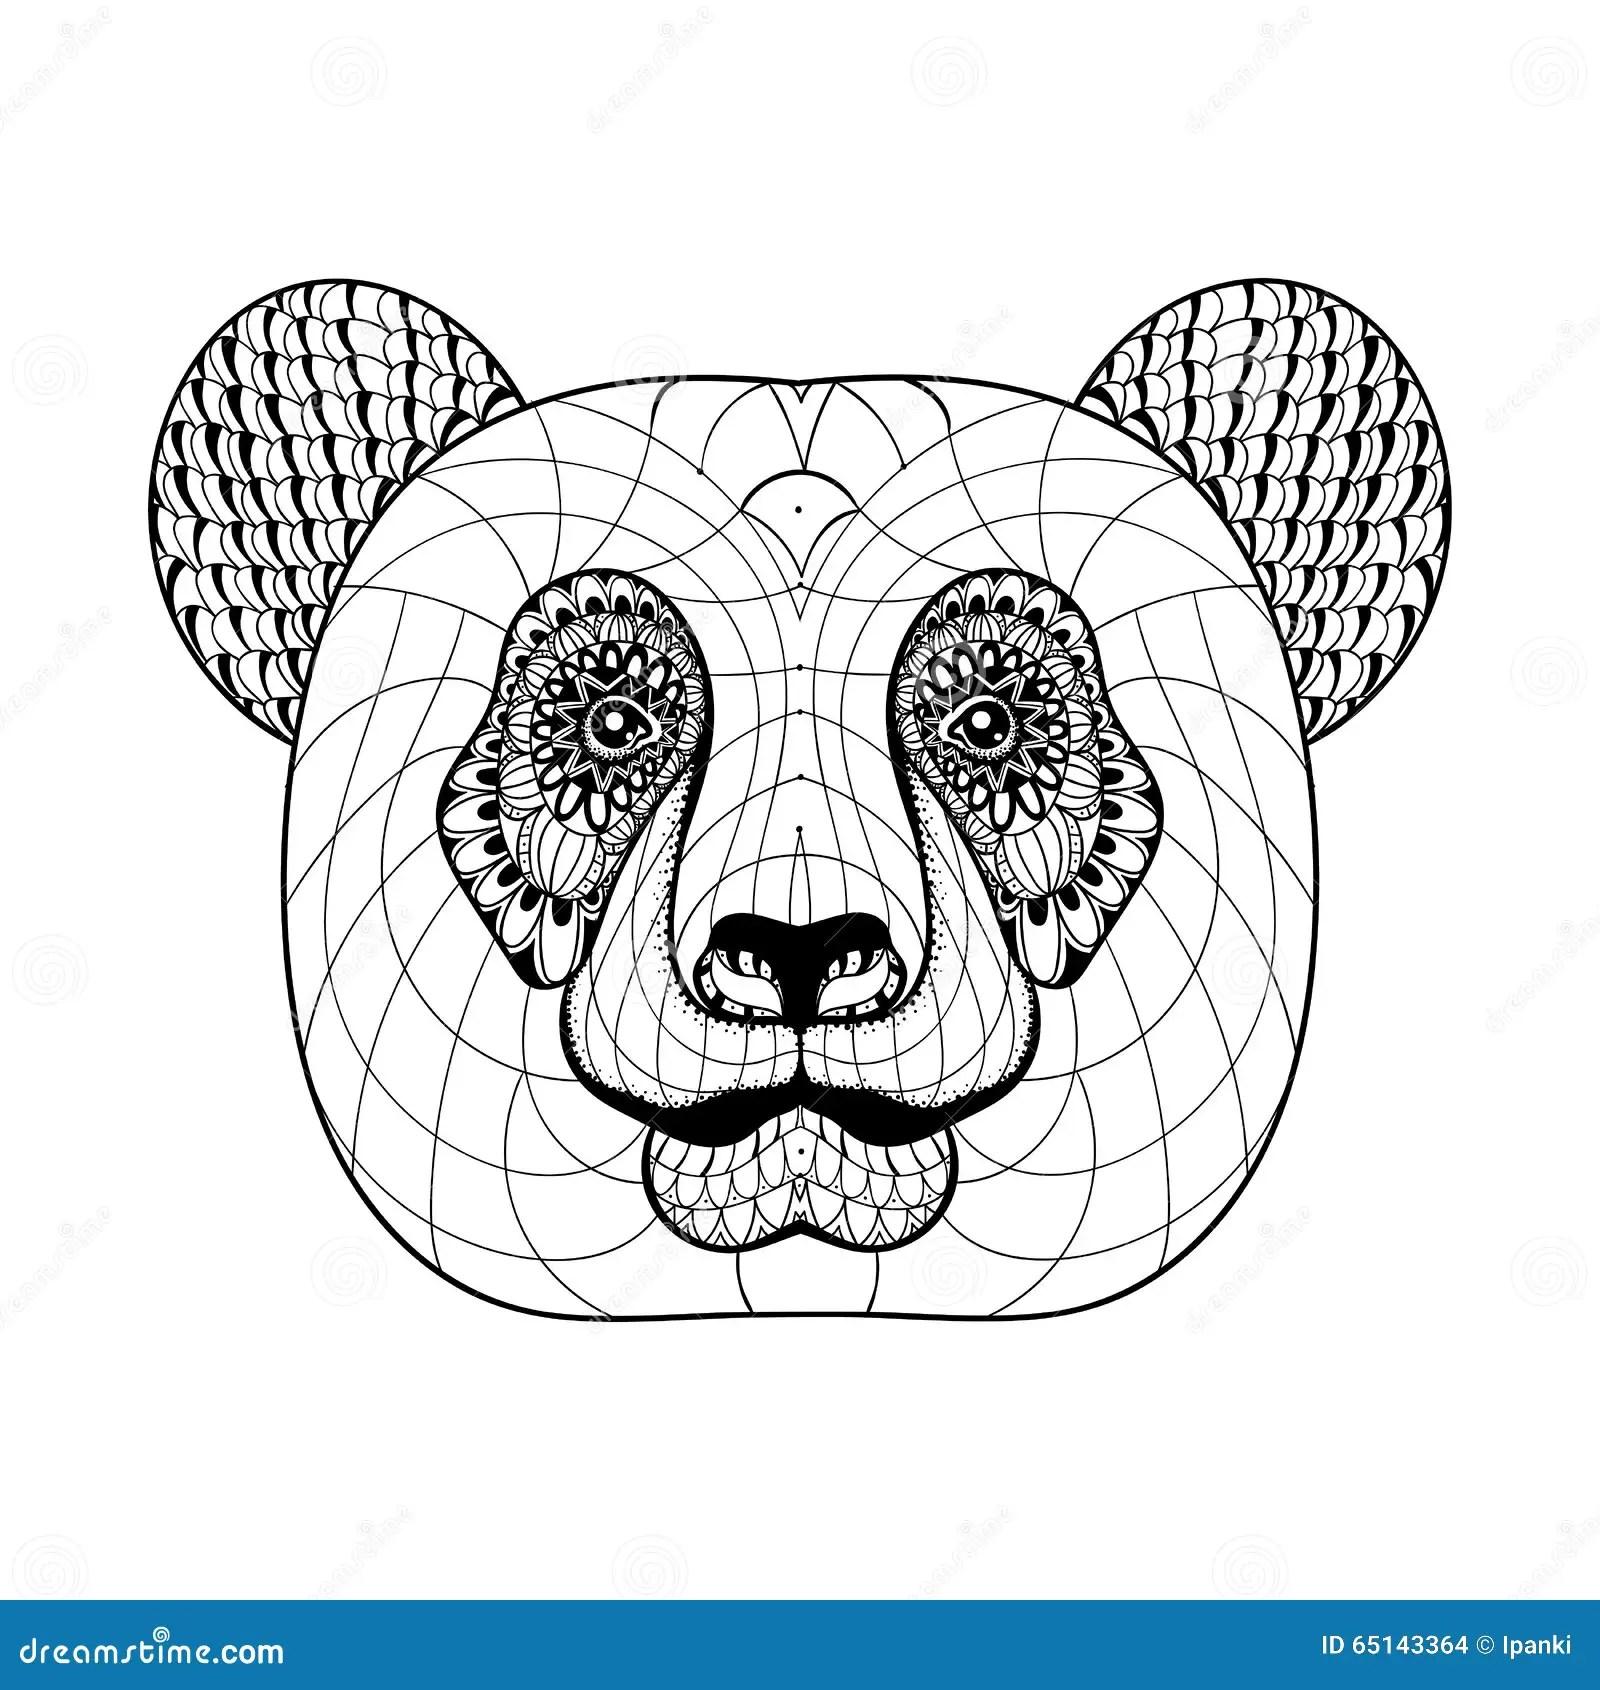 Hand Drawn Artistically Ethnic Ornamental Patterned Panda